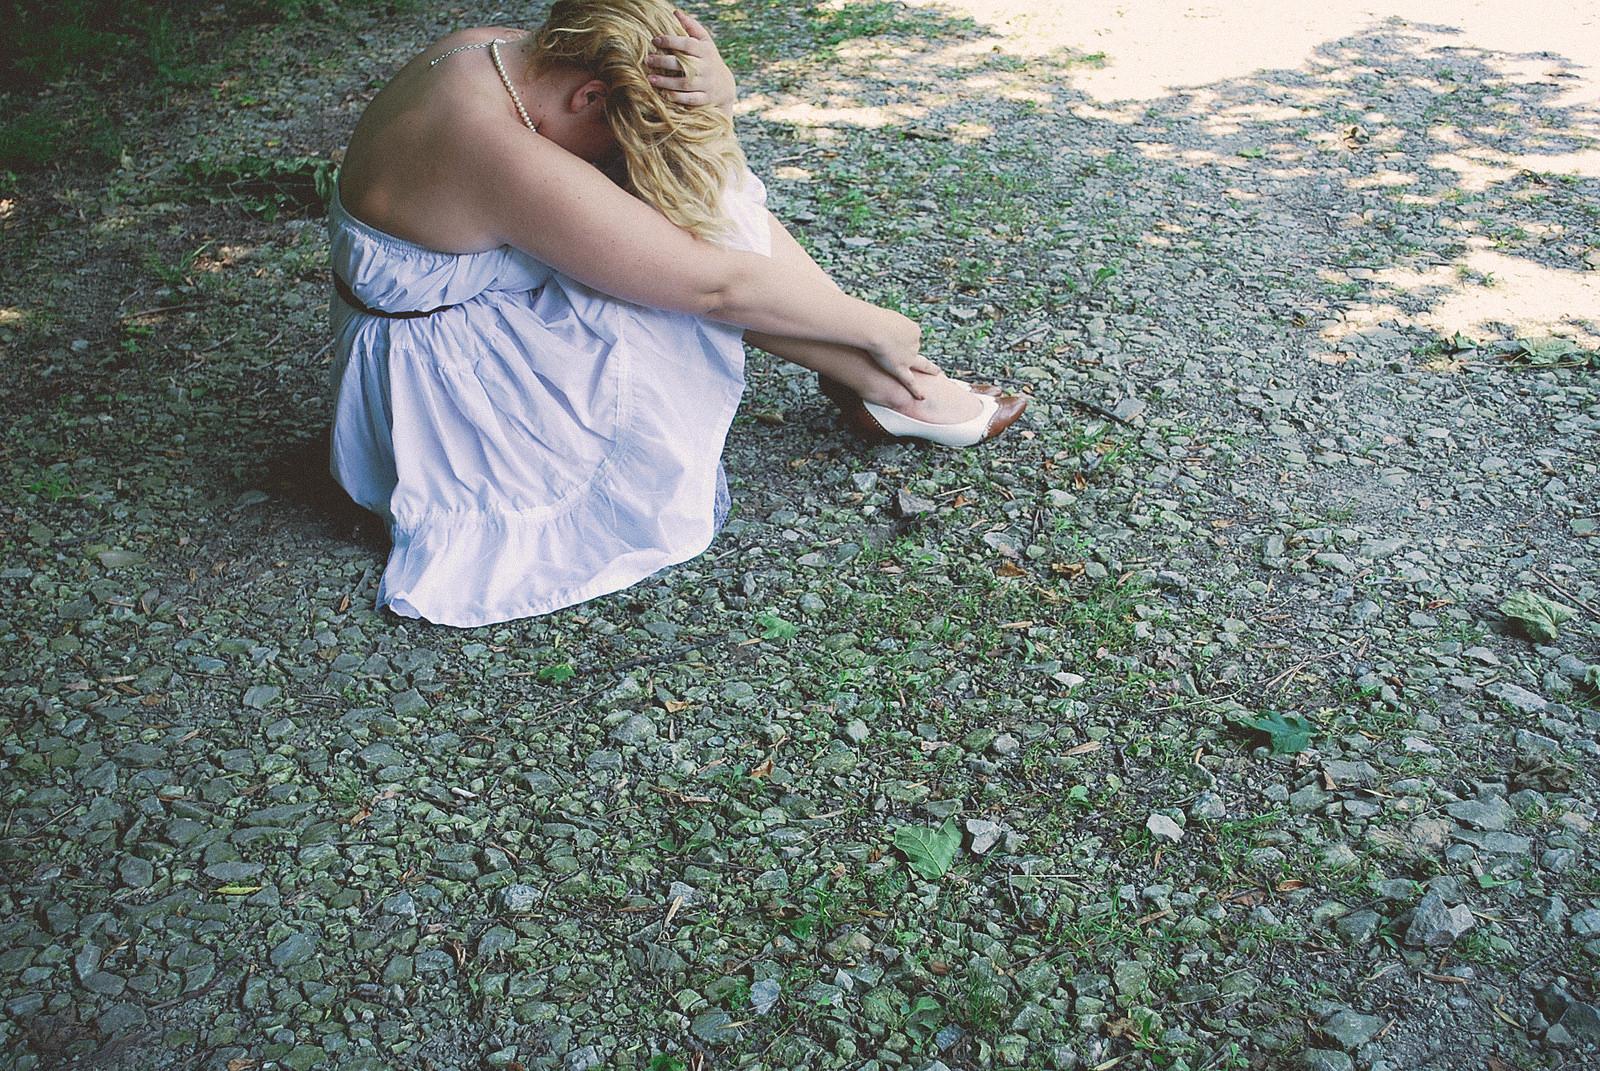 Sommerdepression – Trotz Sonne verzweifelt